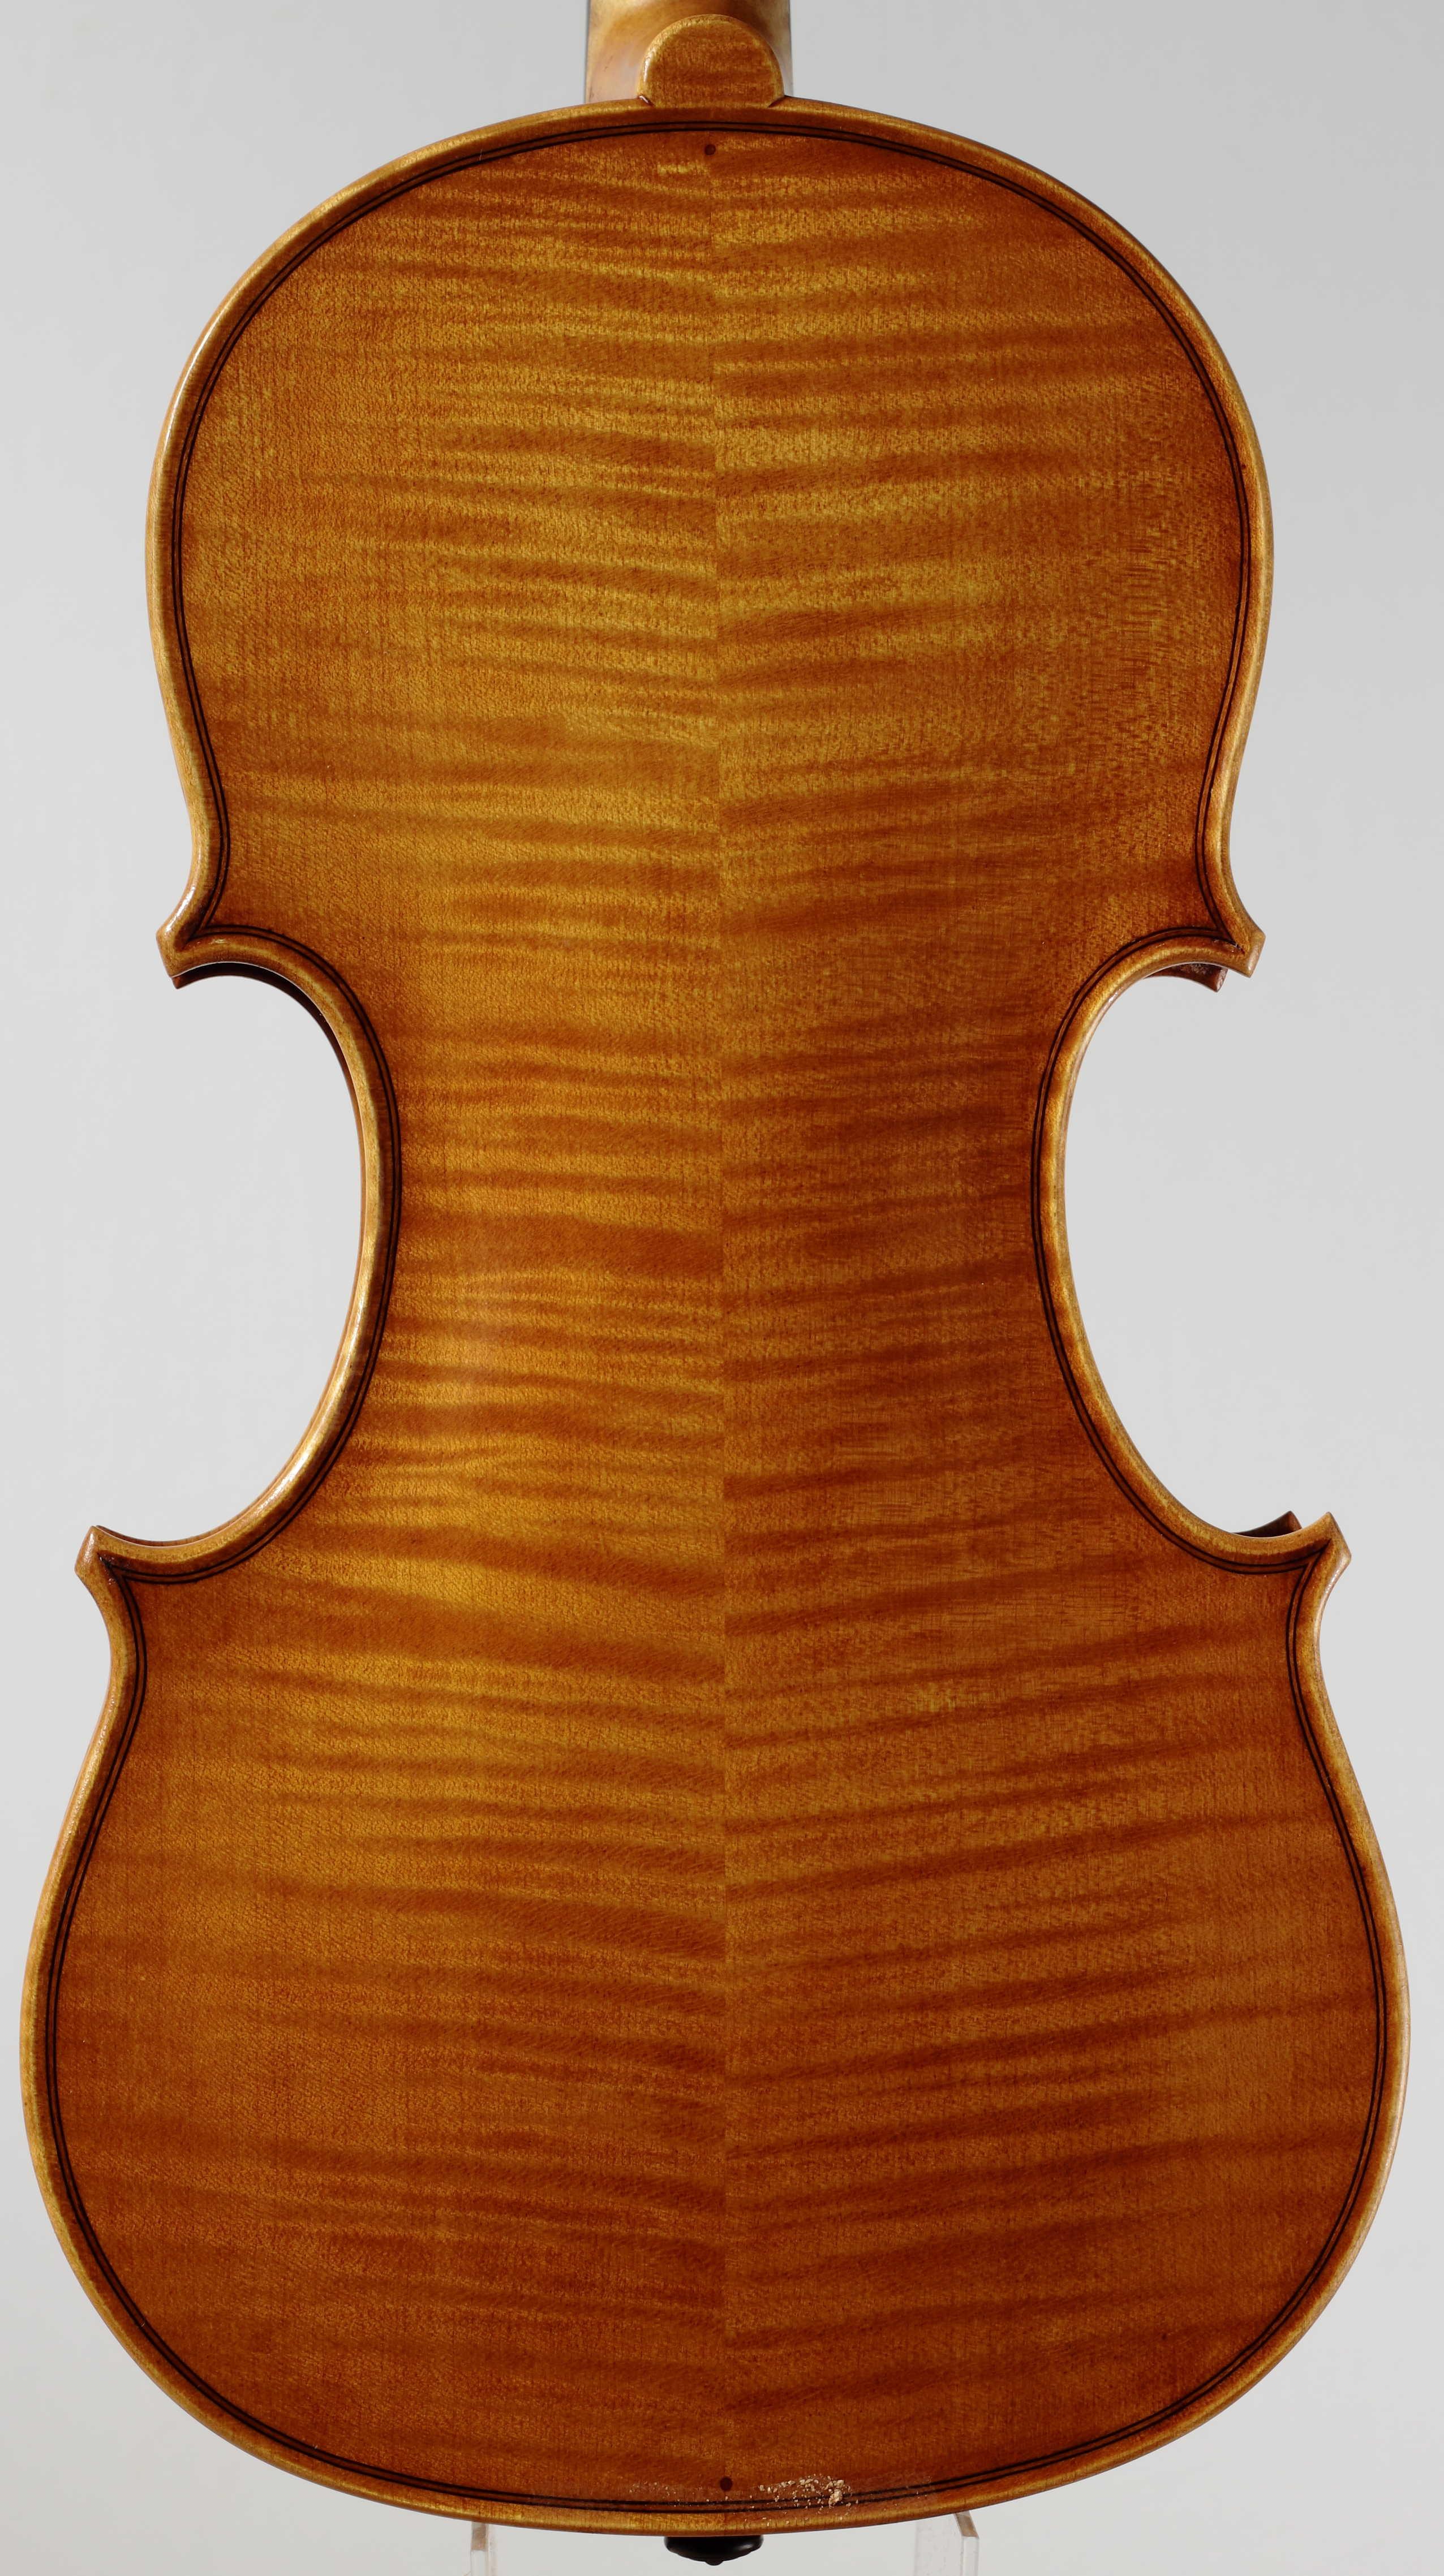 Francesco Piasentini 2012 - Domenico Montagnana patter - violin